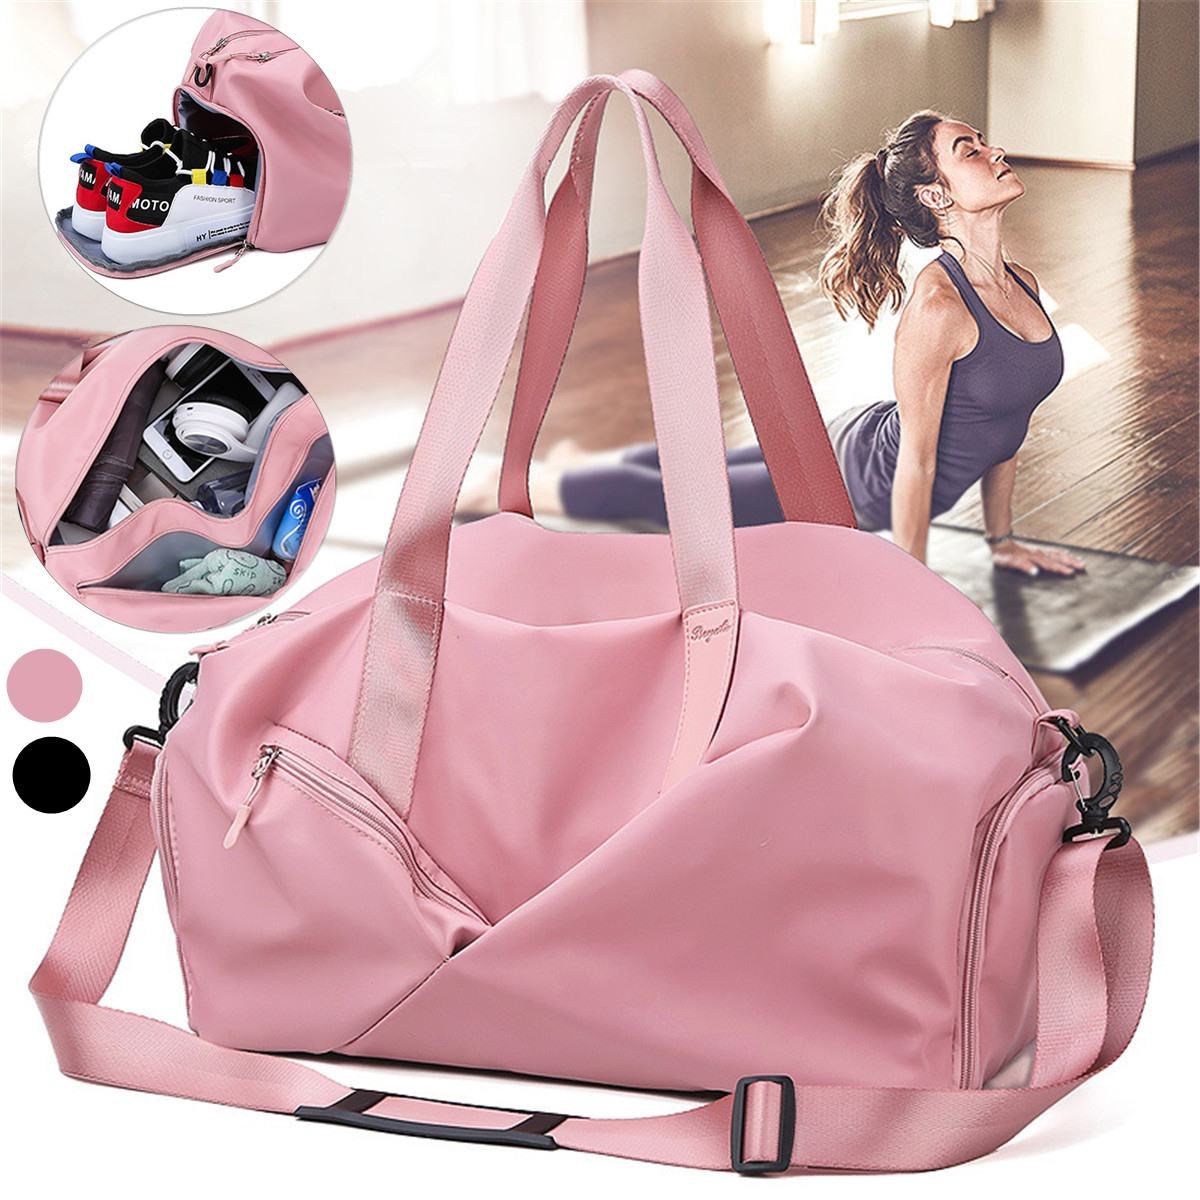 Men Women Gym Bag Sport Fitness Bag Multifunctional Tote Yoga Gym Bags For Shoes Storage Dry/Wet Outdoor Travel Bag Sac De Sport